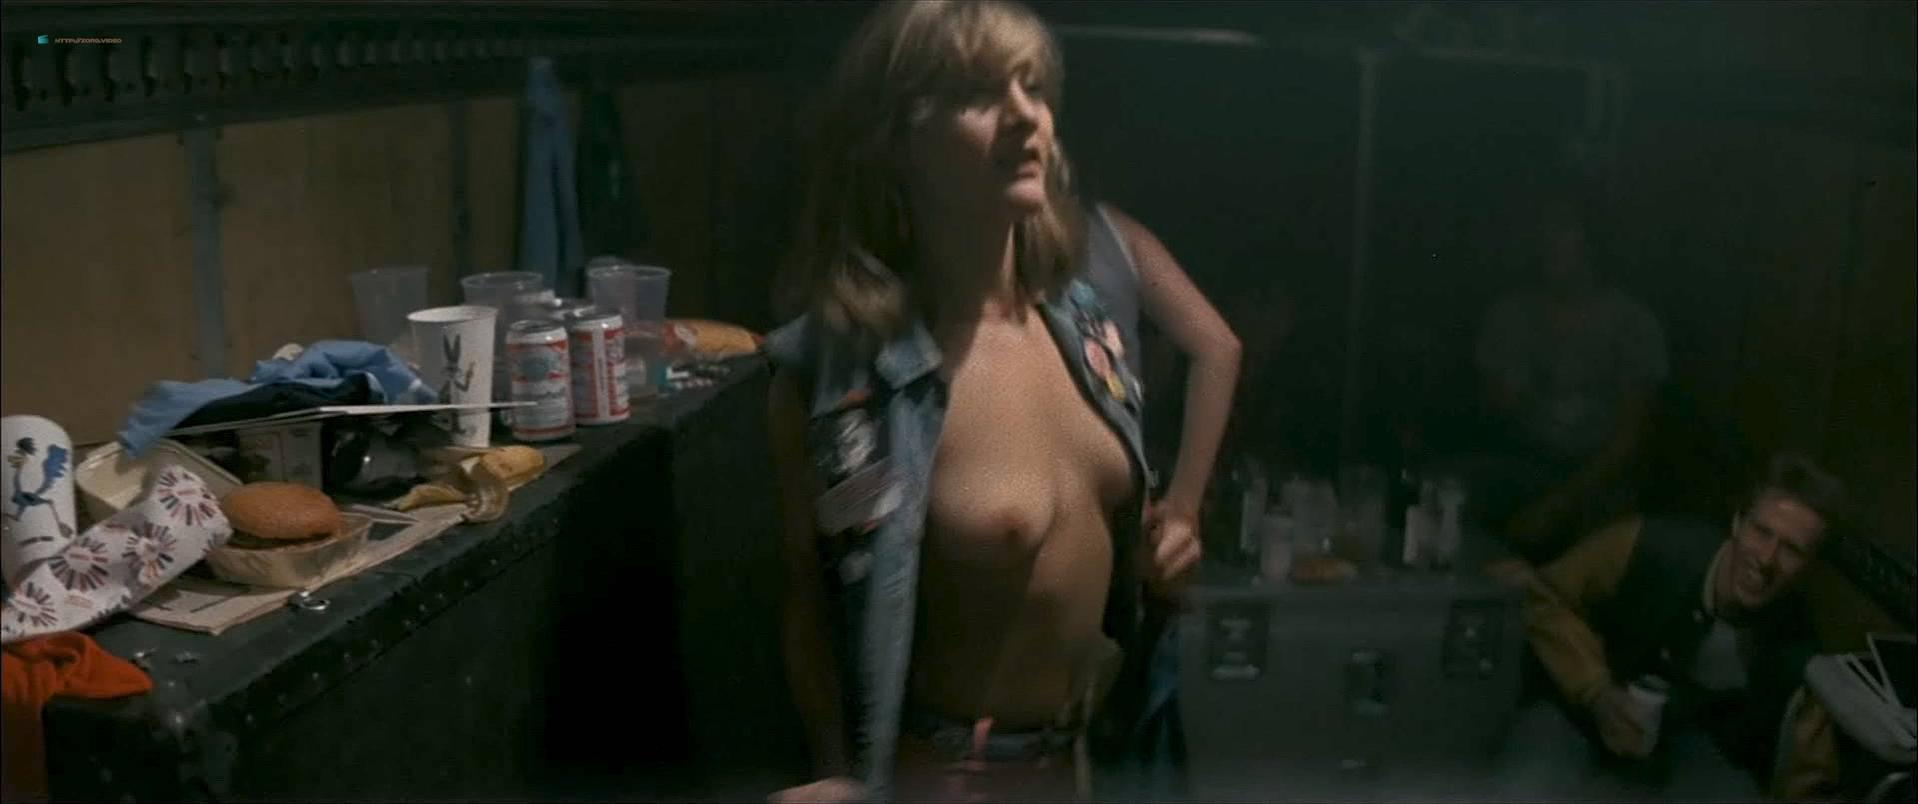 Elsa pataky nude in ninette 1 - 1 part 10